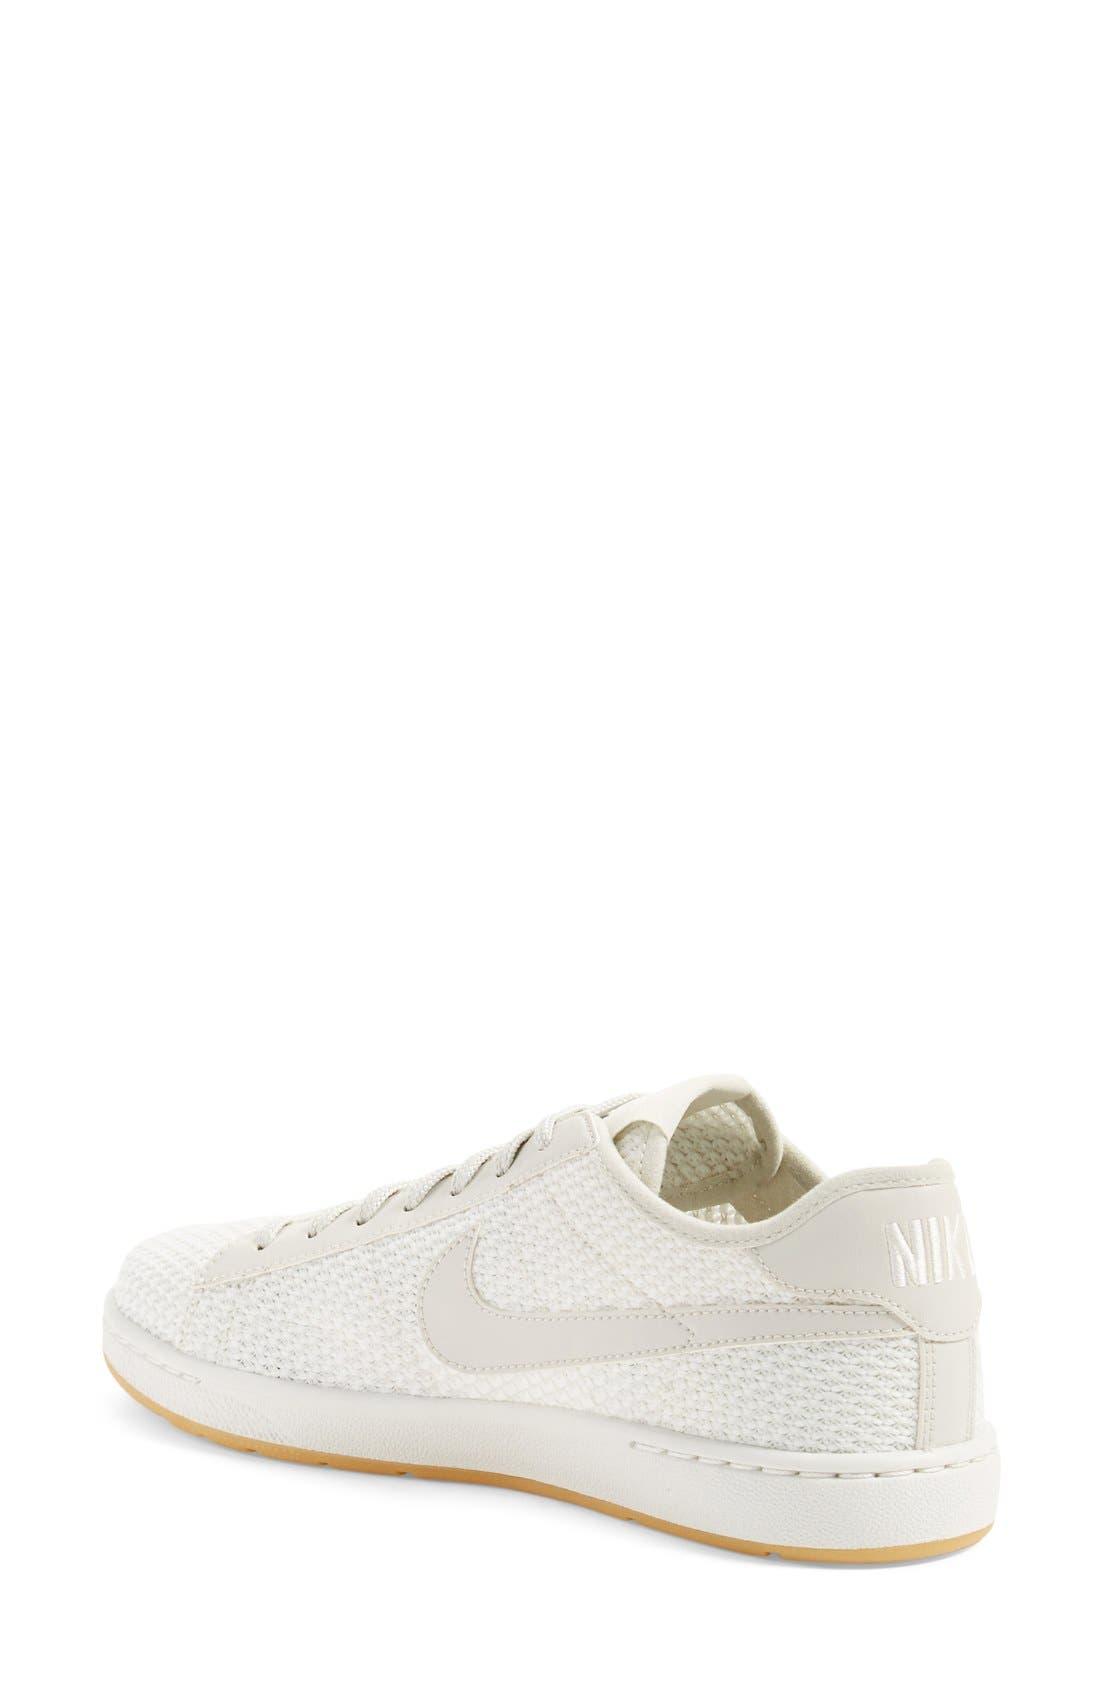 Alternate Image 2  - Nike 'Tennis Classic Ultra -Textile' Sneaker (Women)